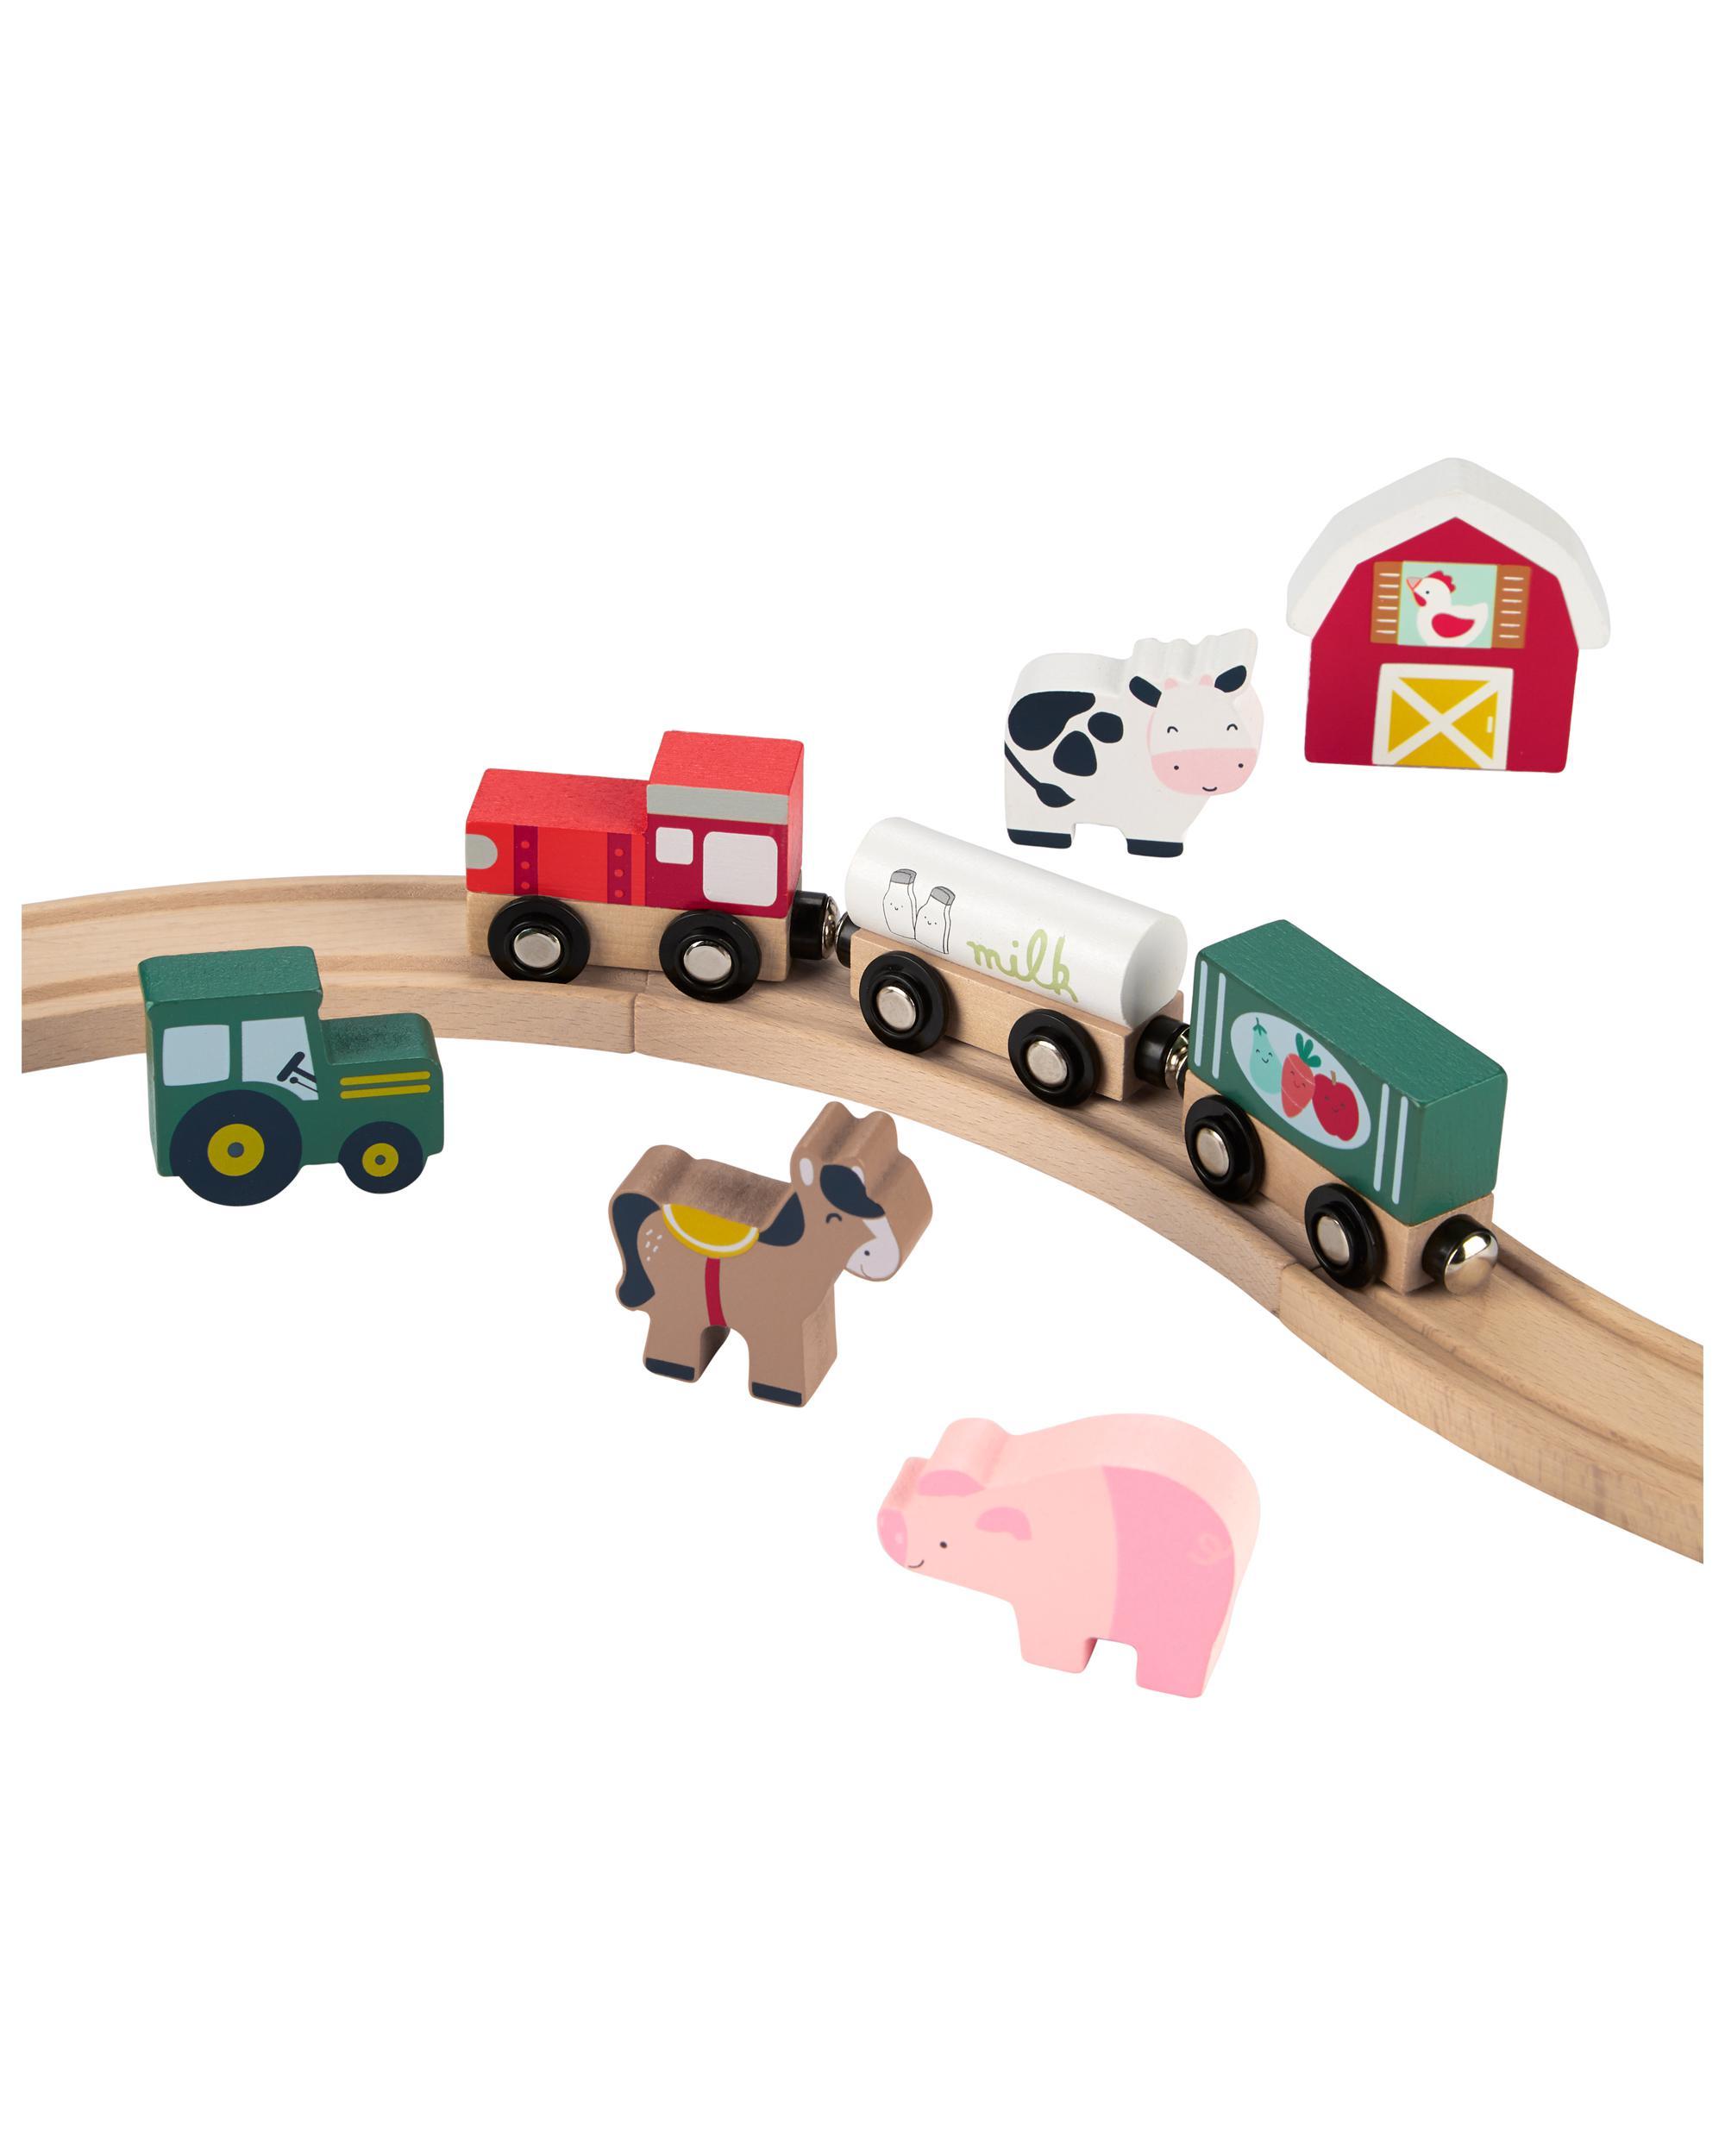 Oshkoshbgosh Wooden Farm Animal & Train Set